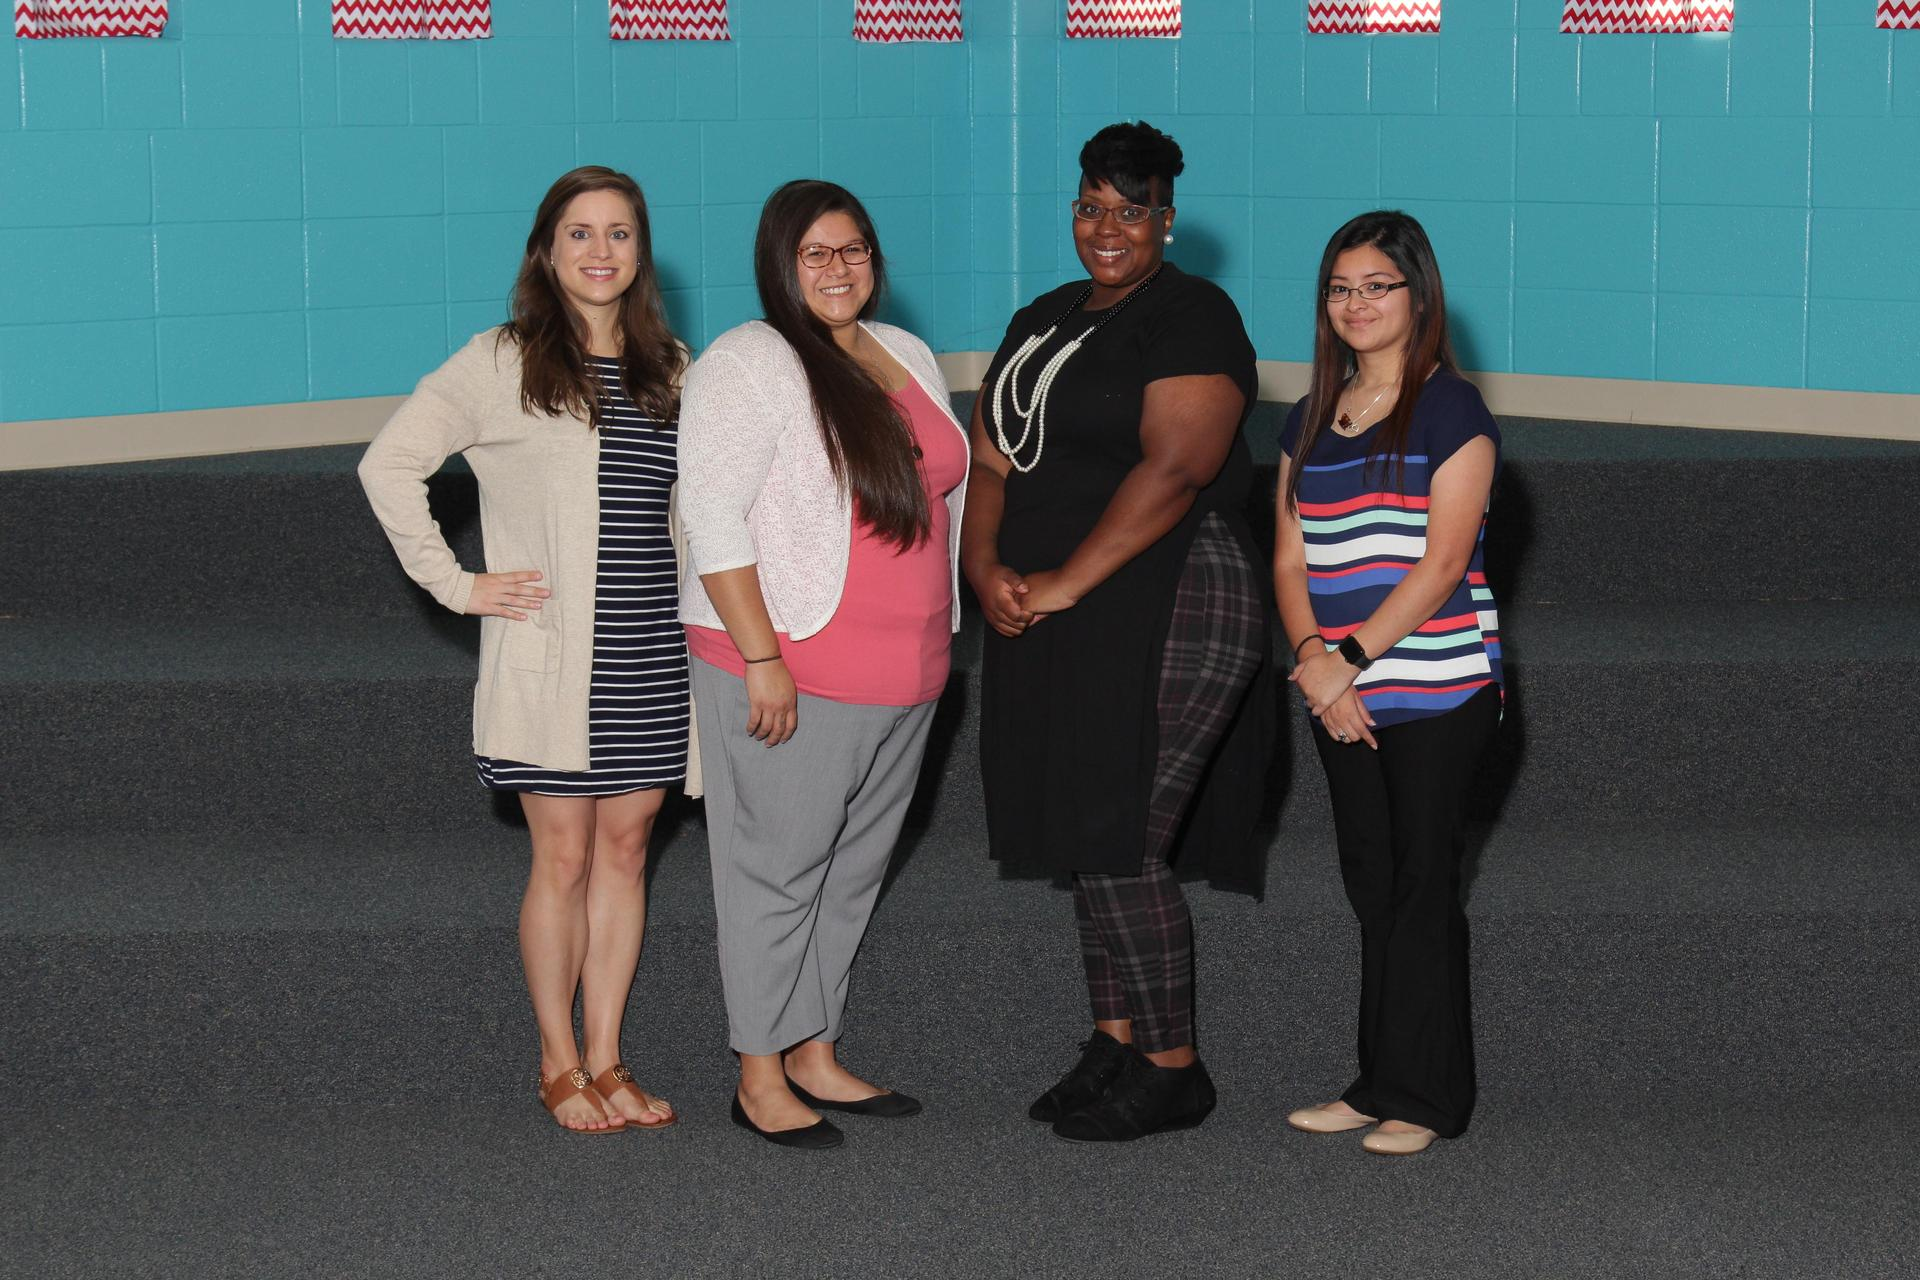 Group photo of PreK Staff